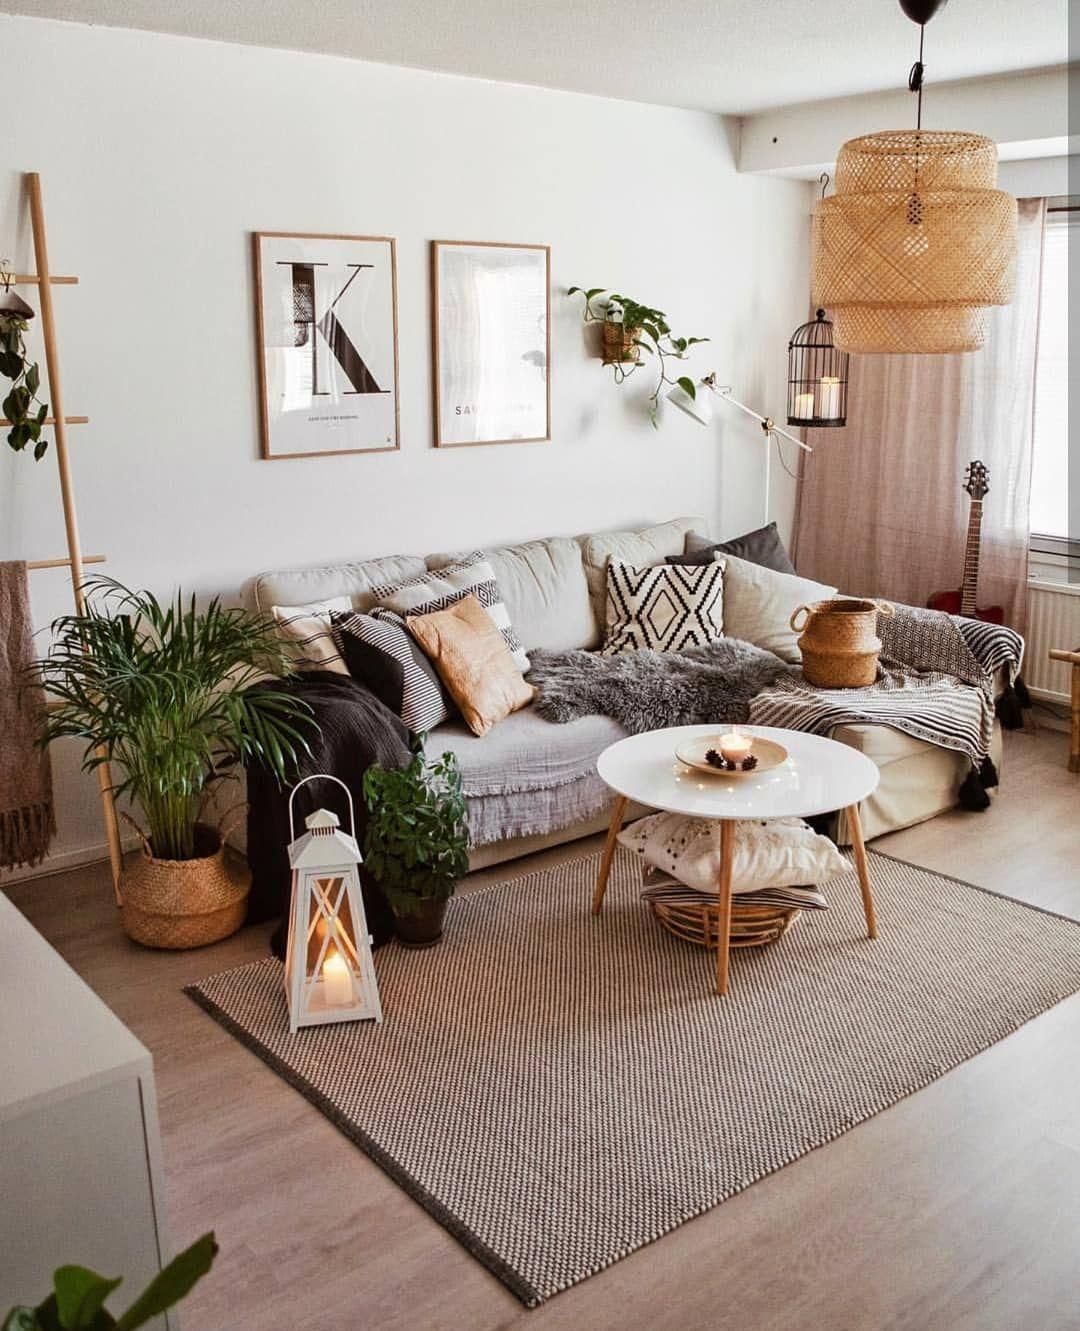 Bohemian Inspirations On Instagram Let S Talk About Neutraldecor The Earth Tones About This G Living Room Decor Modern Elegant Dorm Room Dorm Room Decor